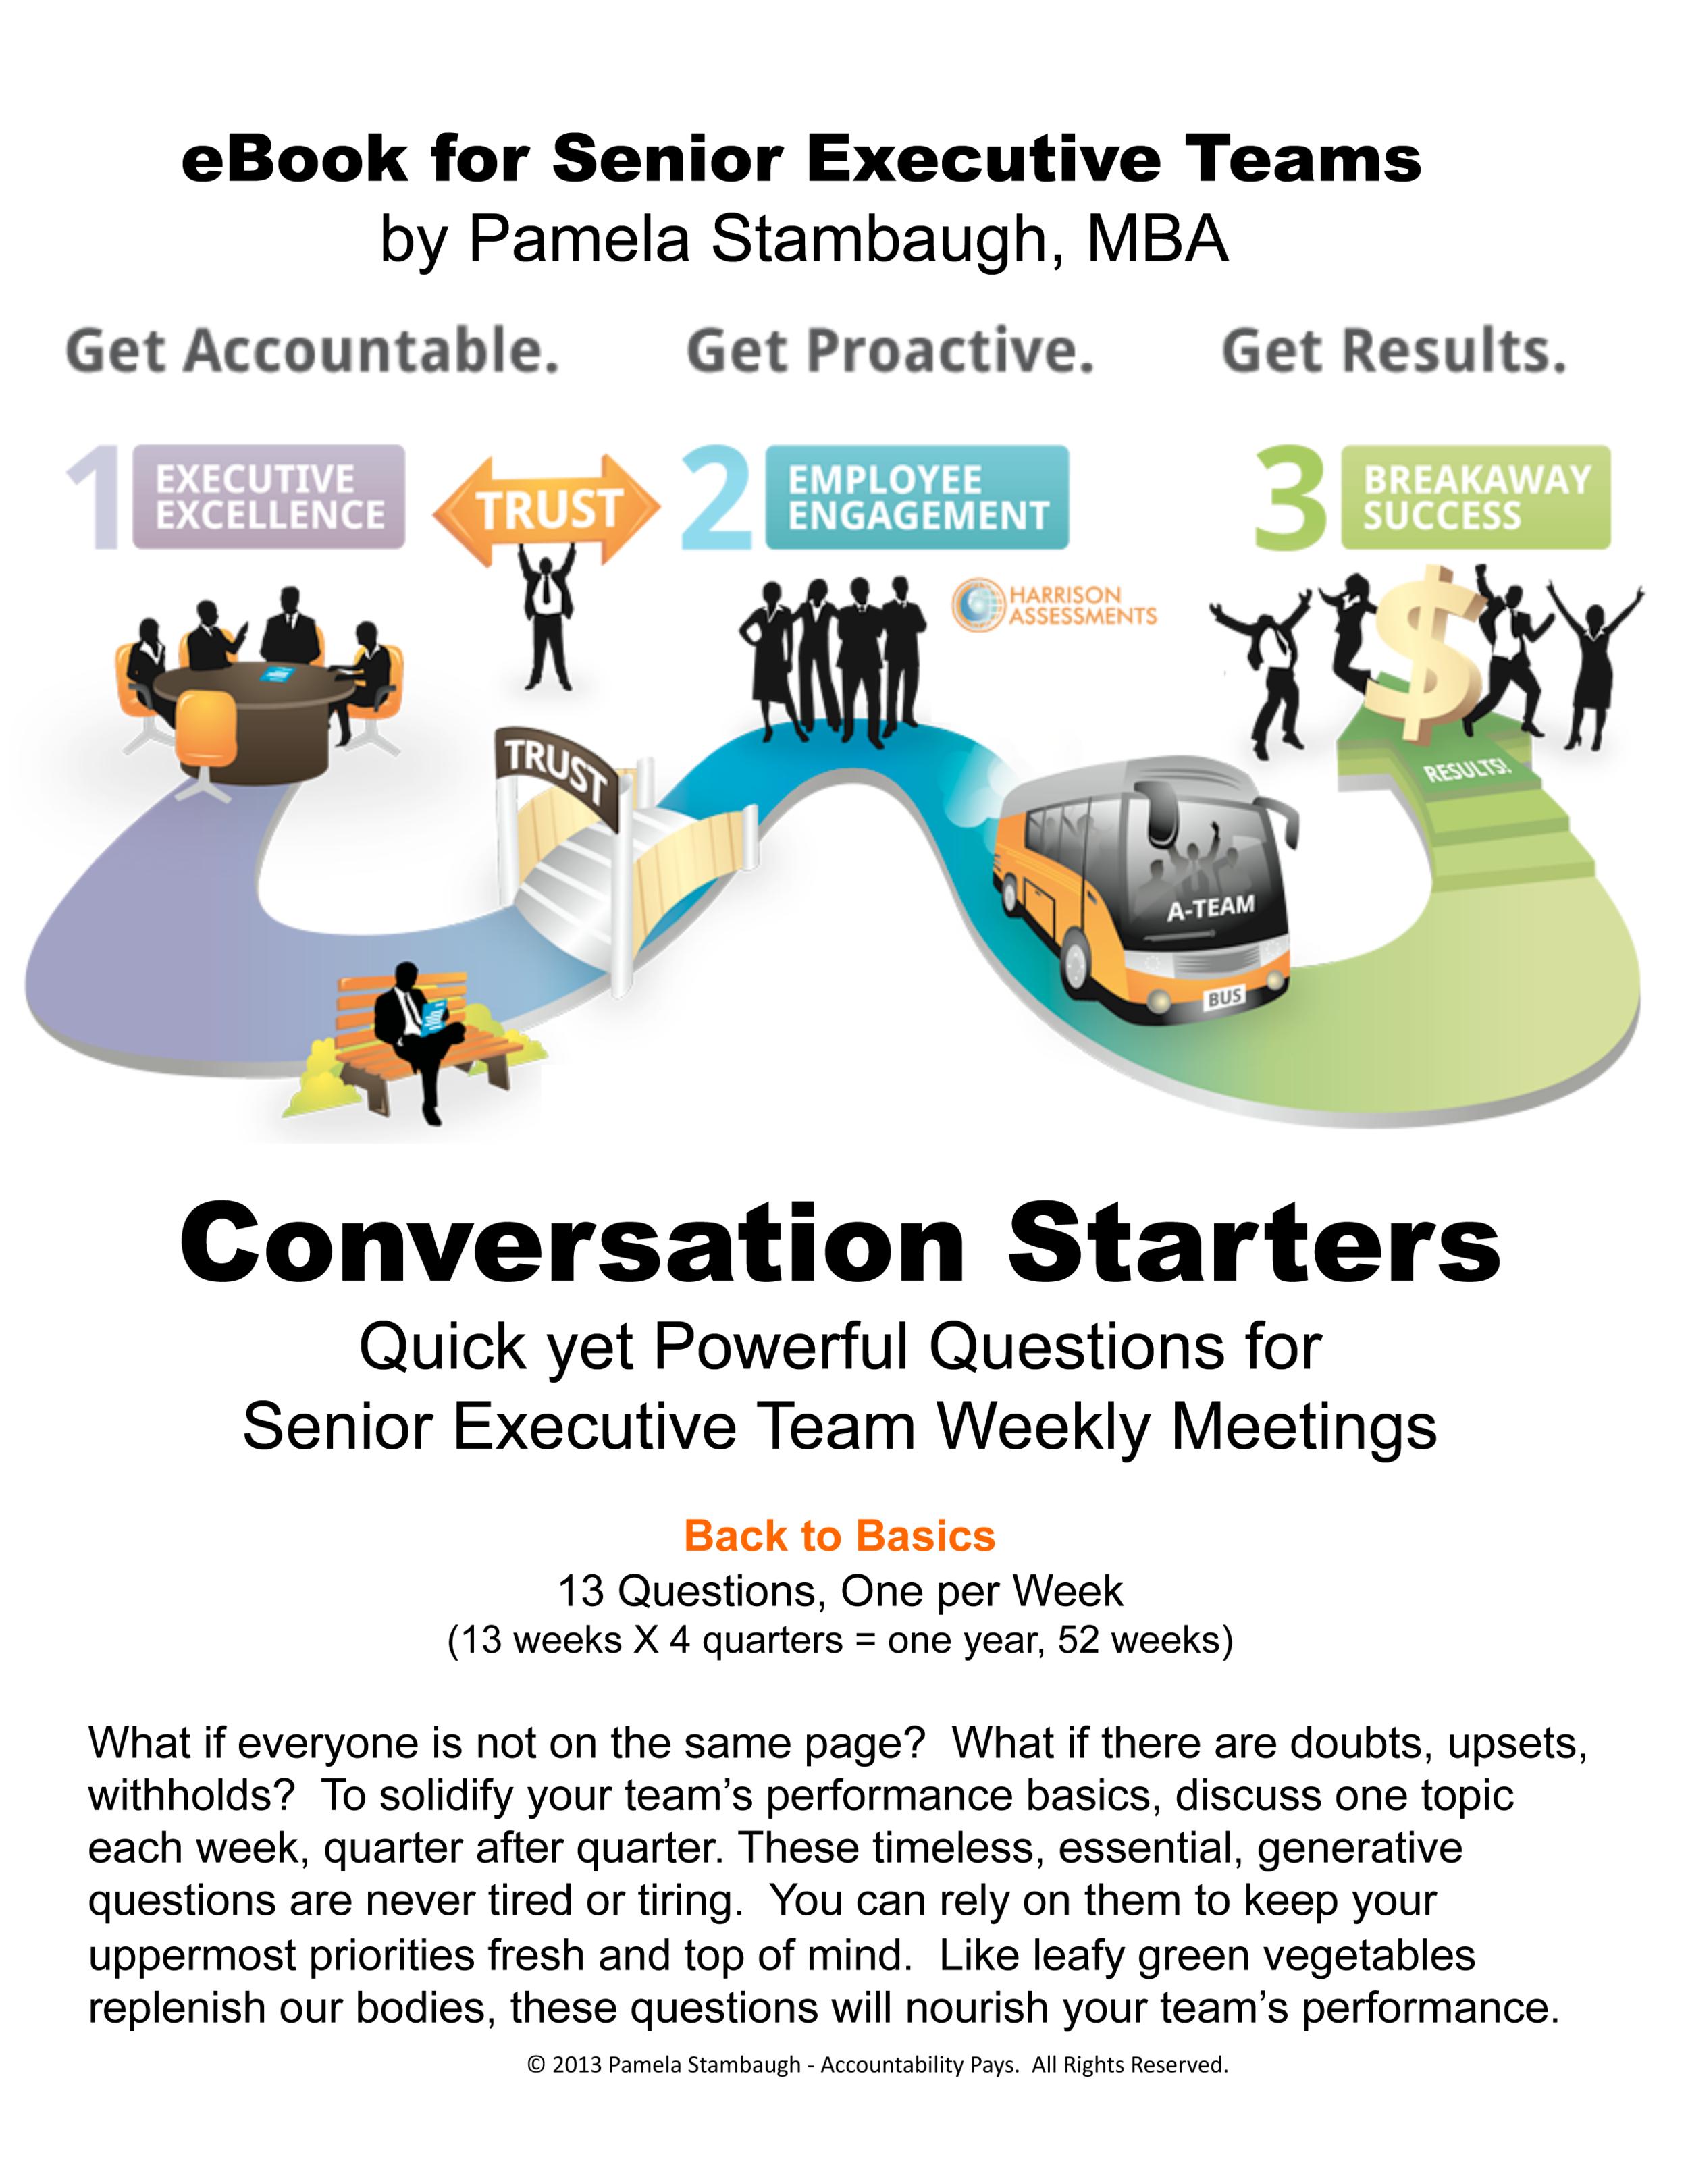 seniorexecutiveteamconversationstarters-140619093923-phpapp01-1